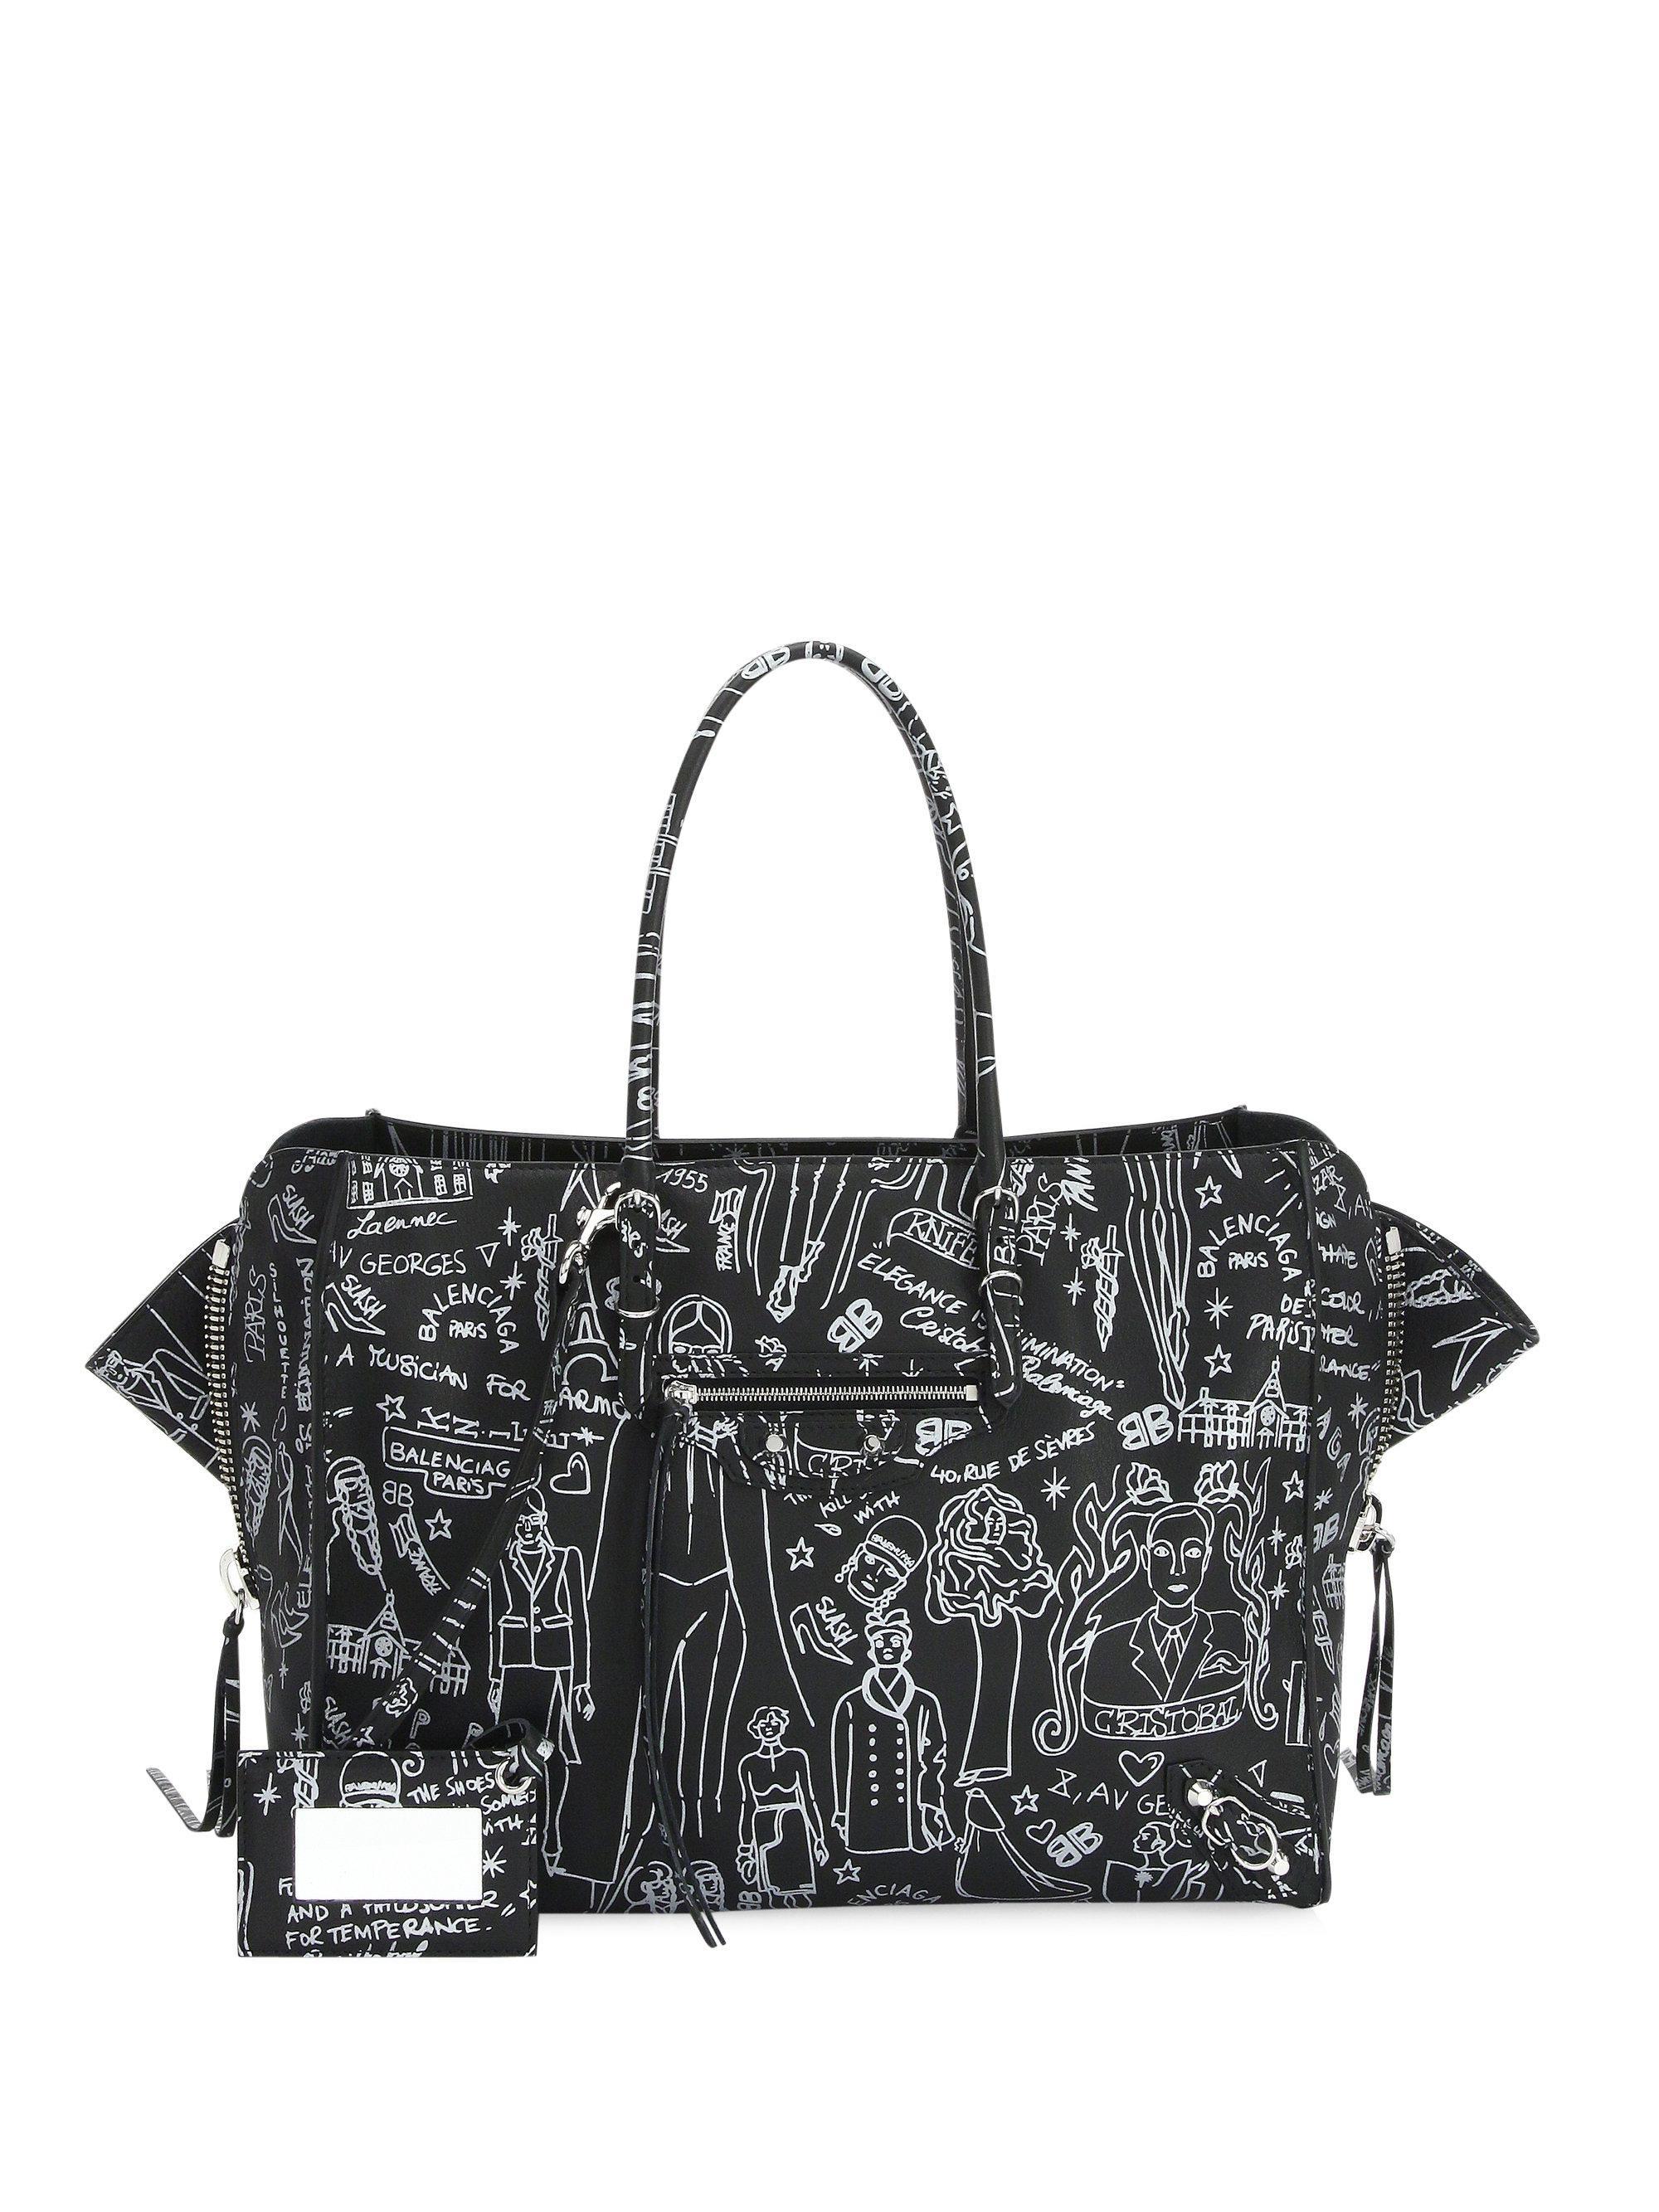 Balenciaga Metallic Papier B4 Tattoo Zip Around Handbag